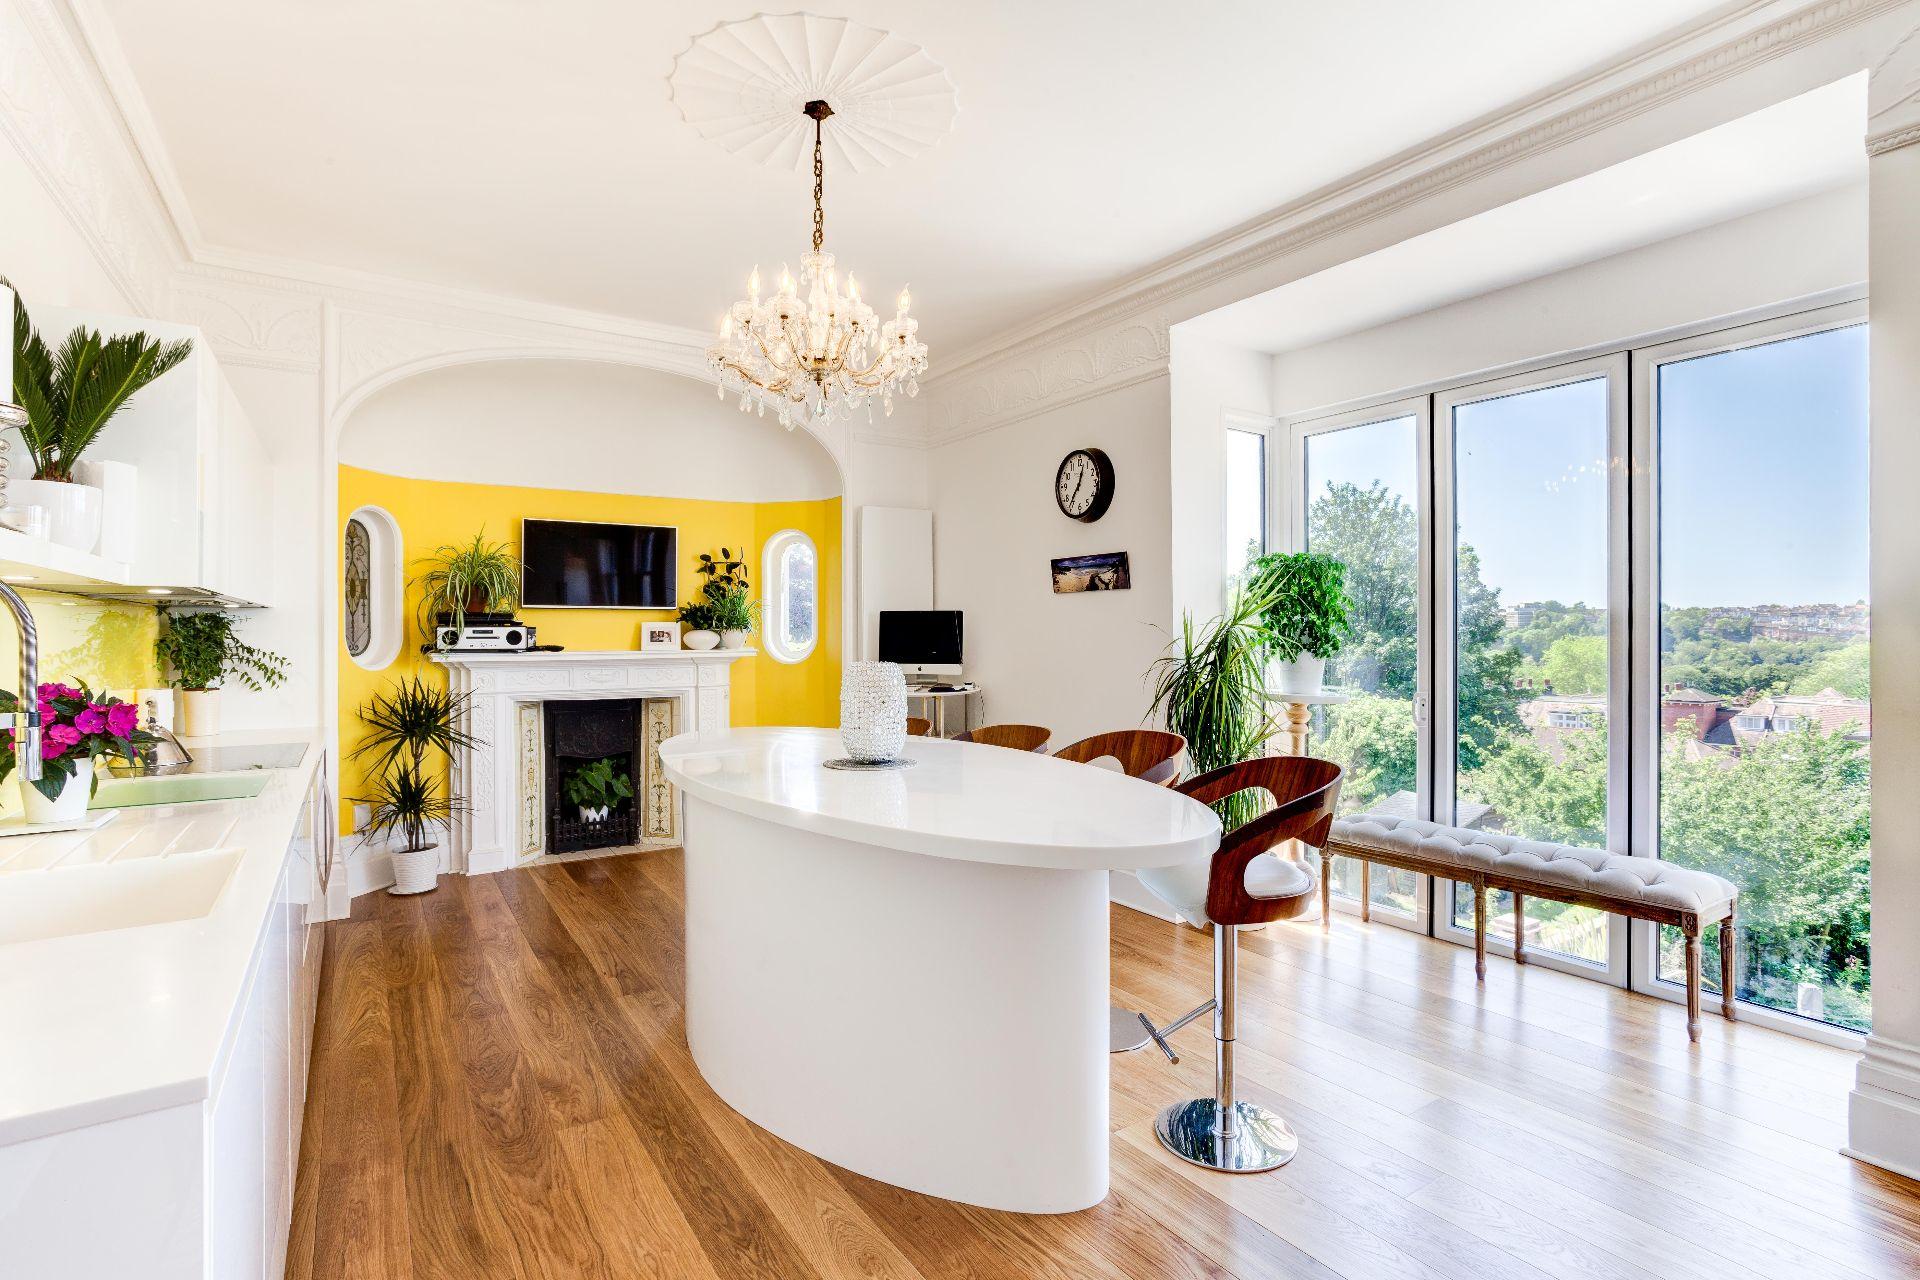 Roseberry House, Beaconsfield Villas, Blakers Park, Brighton